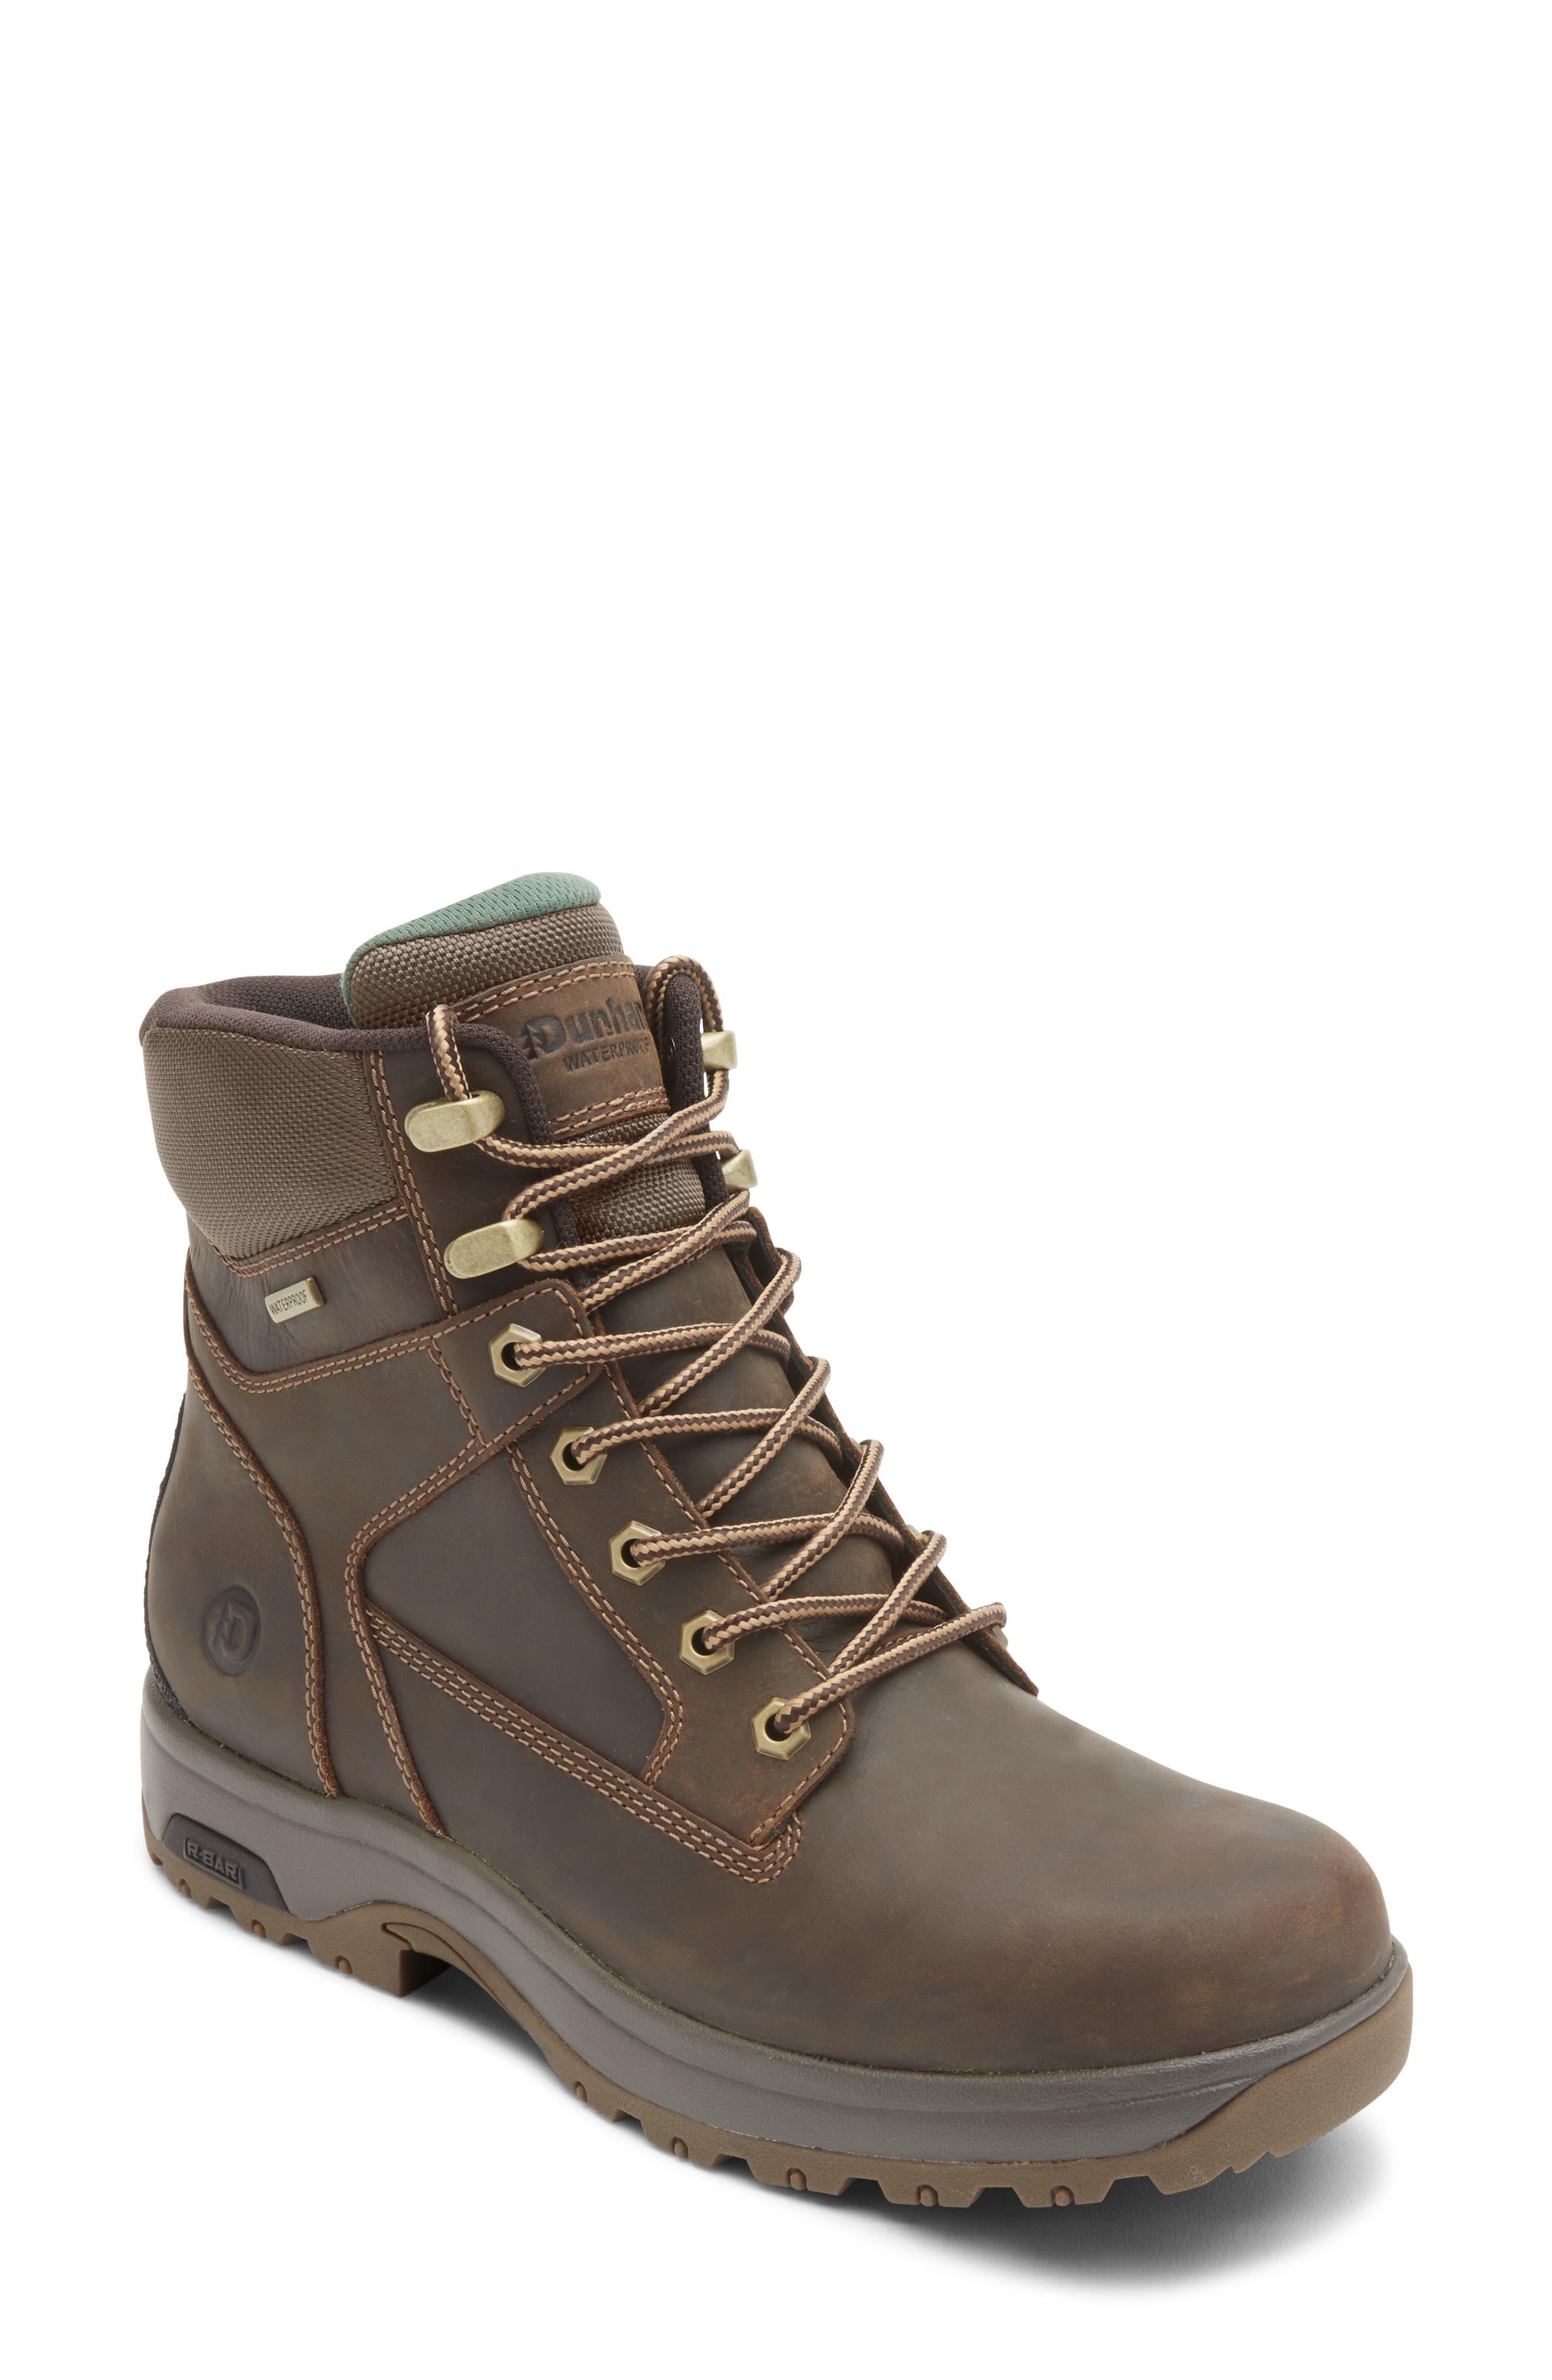 8000 Works Waterproof Plain Toe Boot